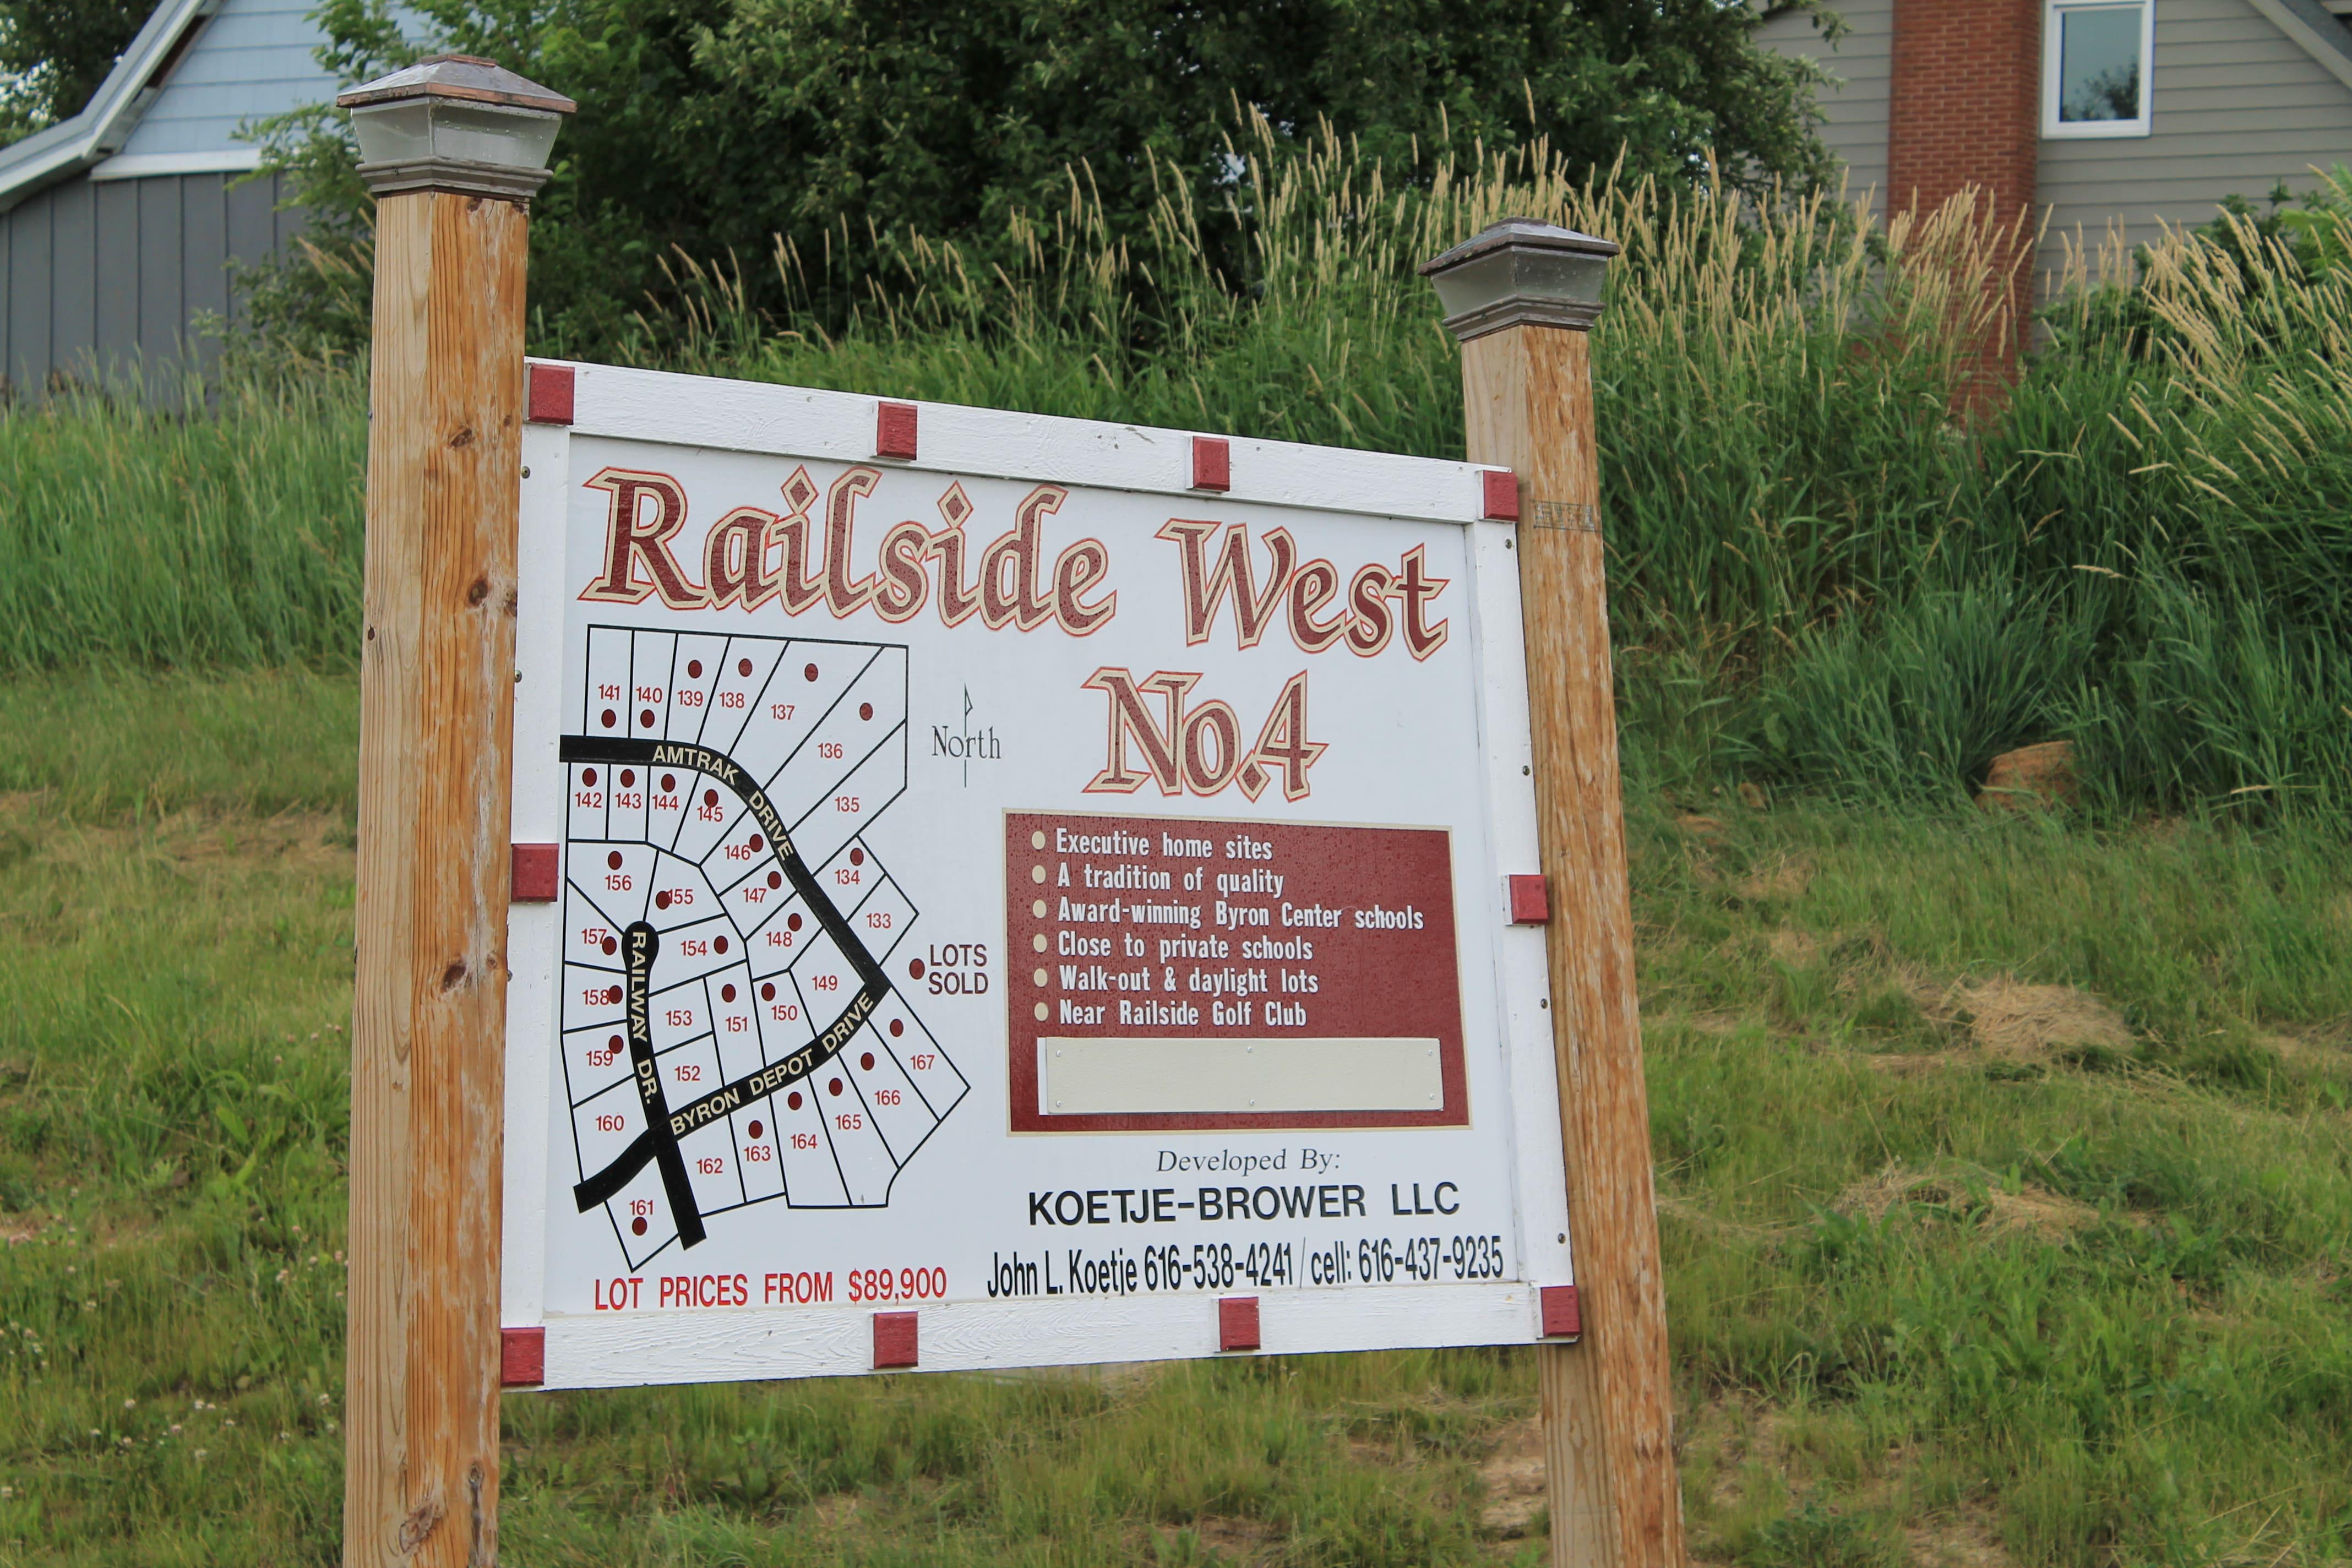 Plat Map of Railside West